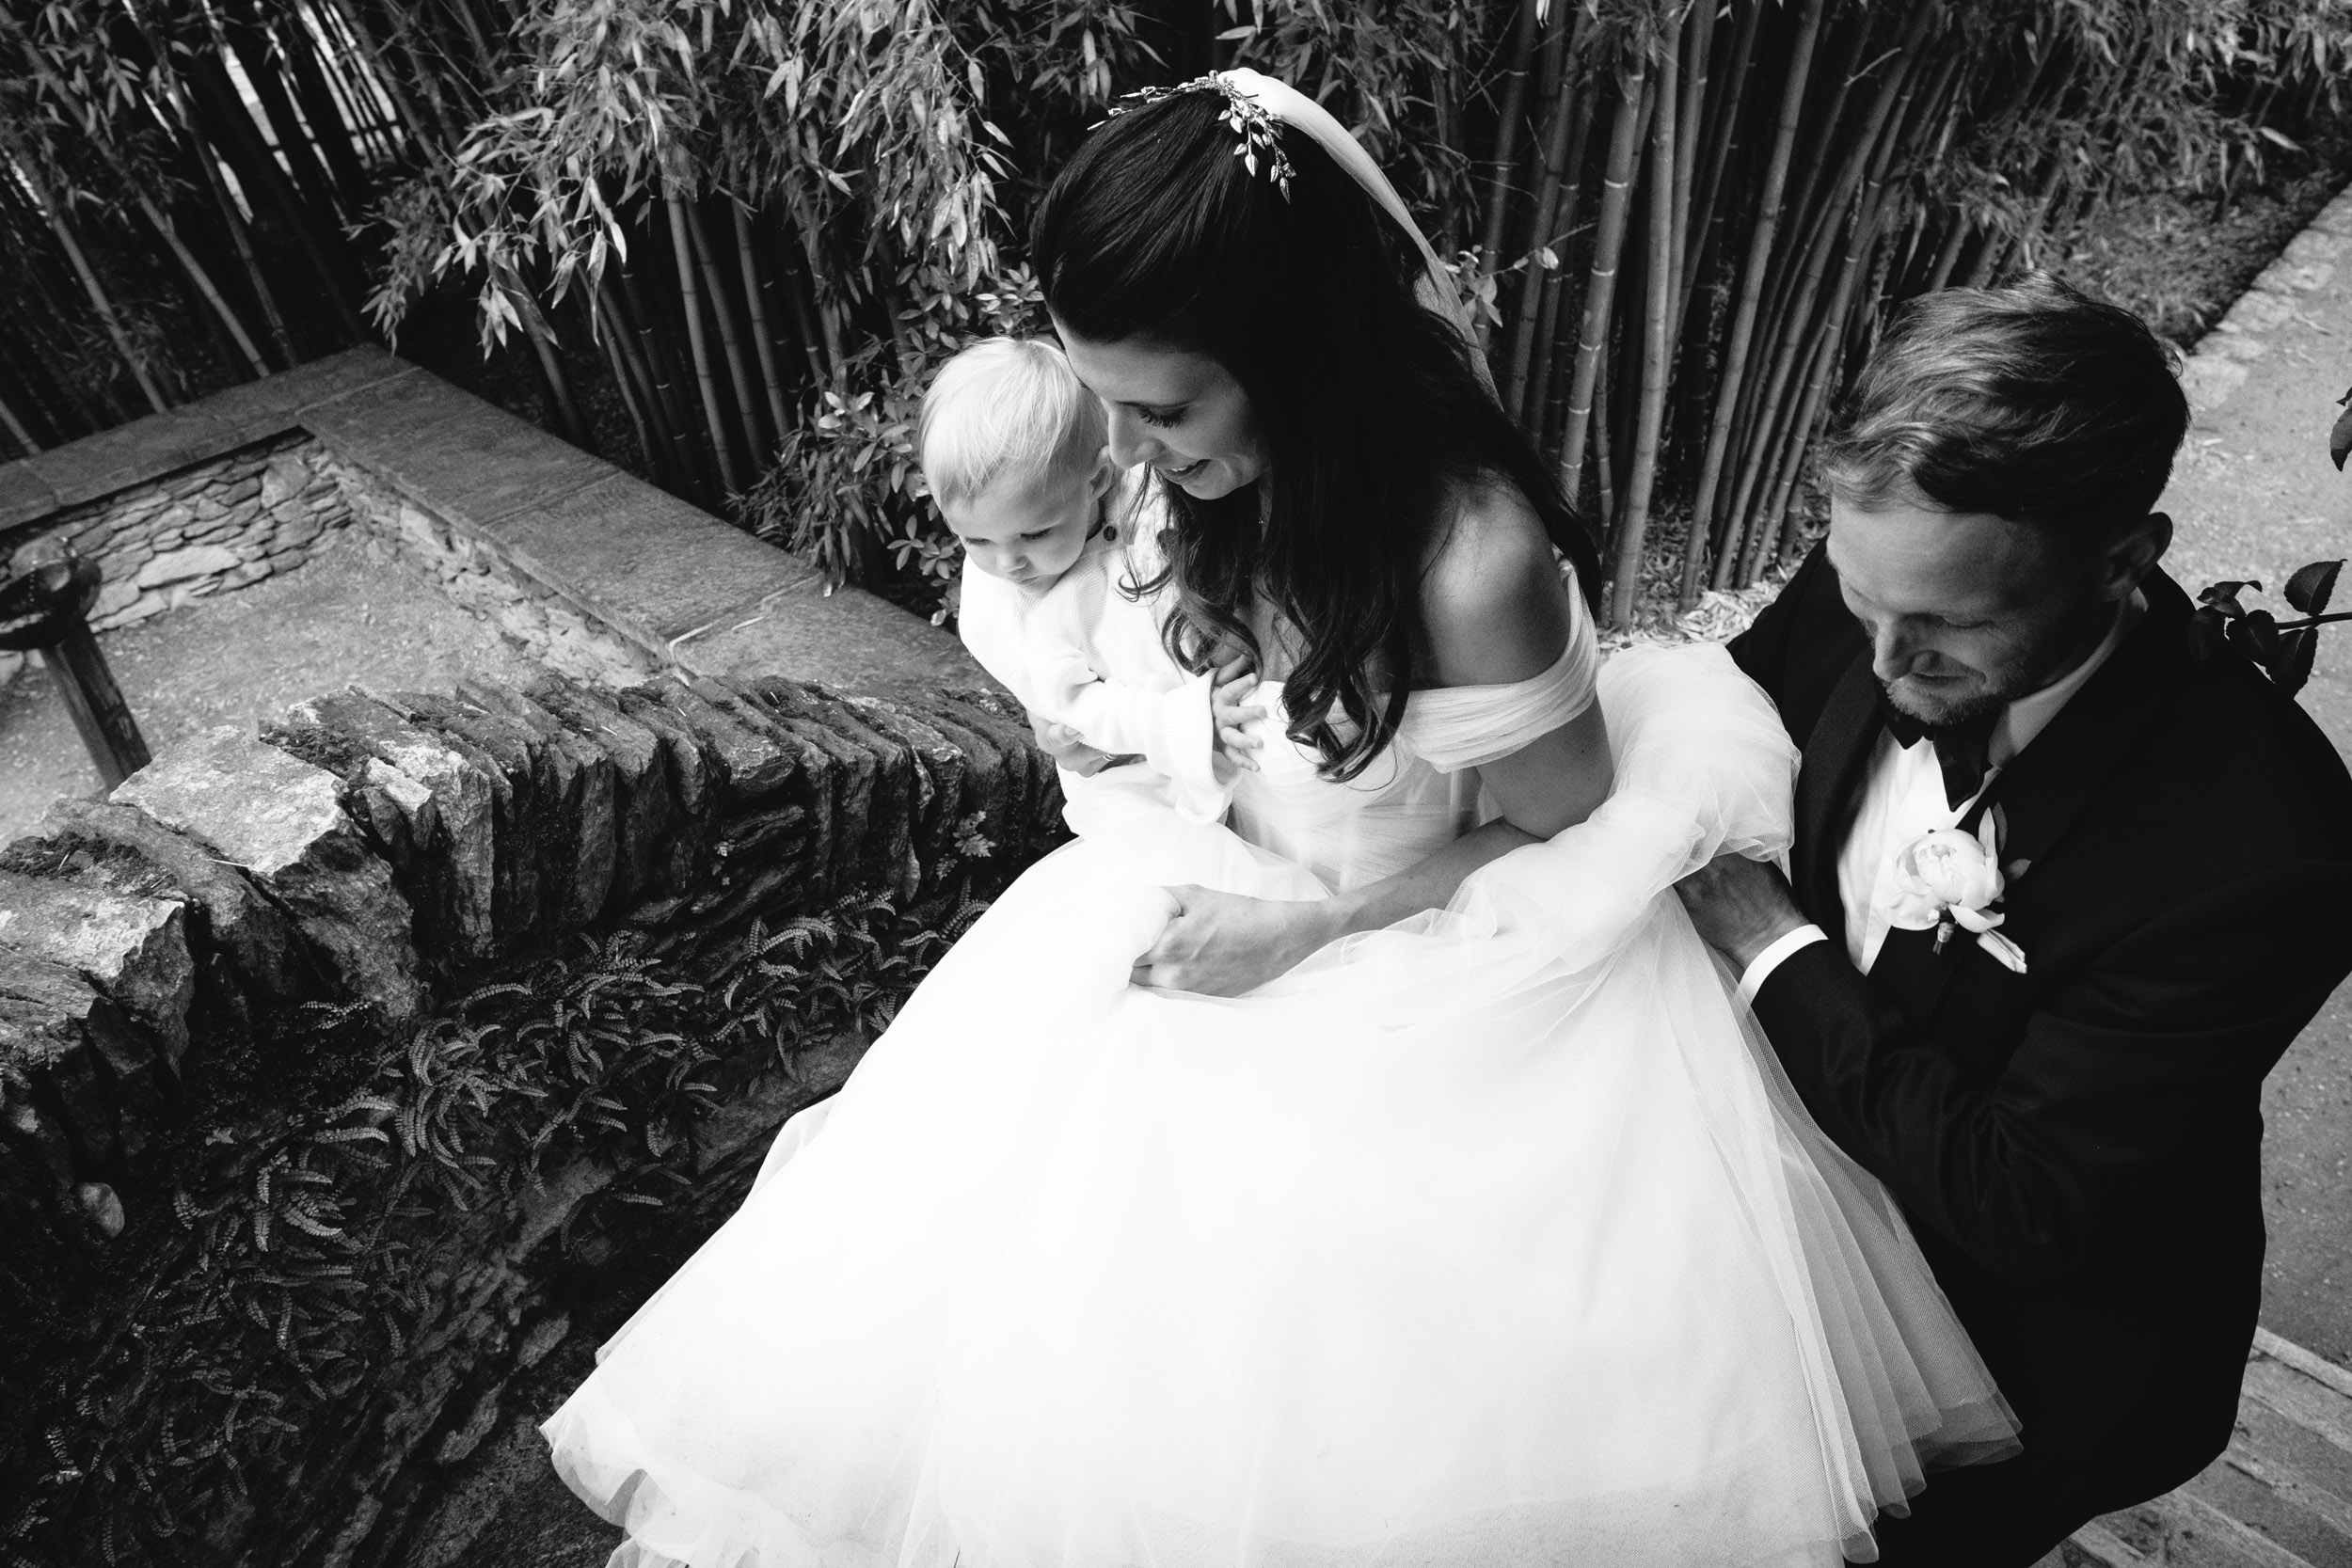 olivia-andreas-wedding-switzerland-333.jpg